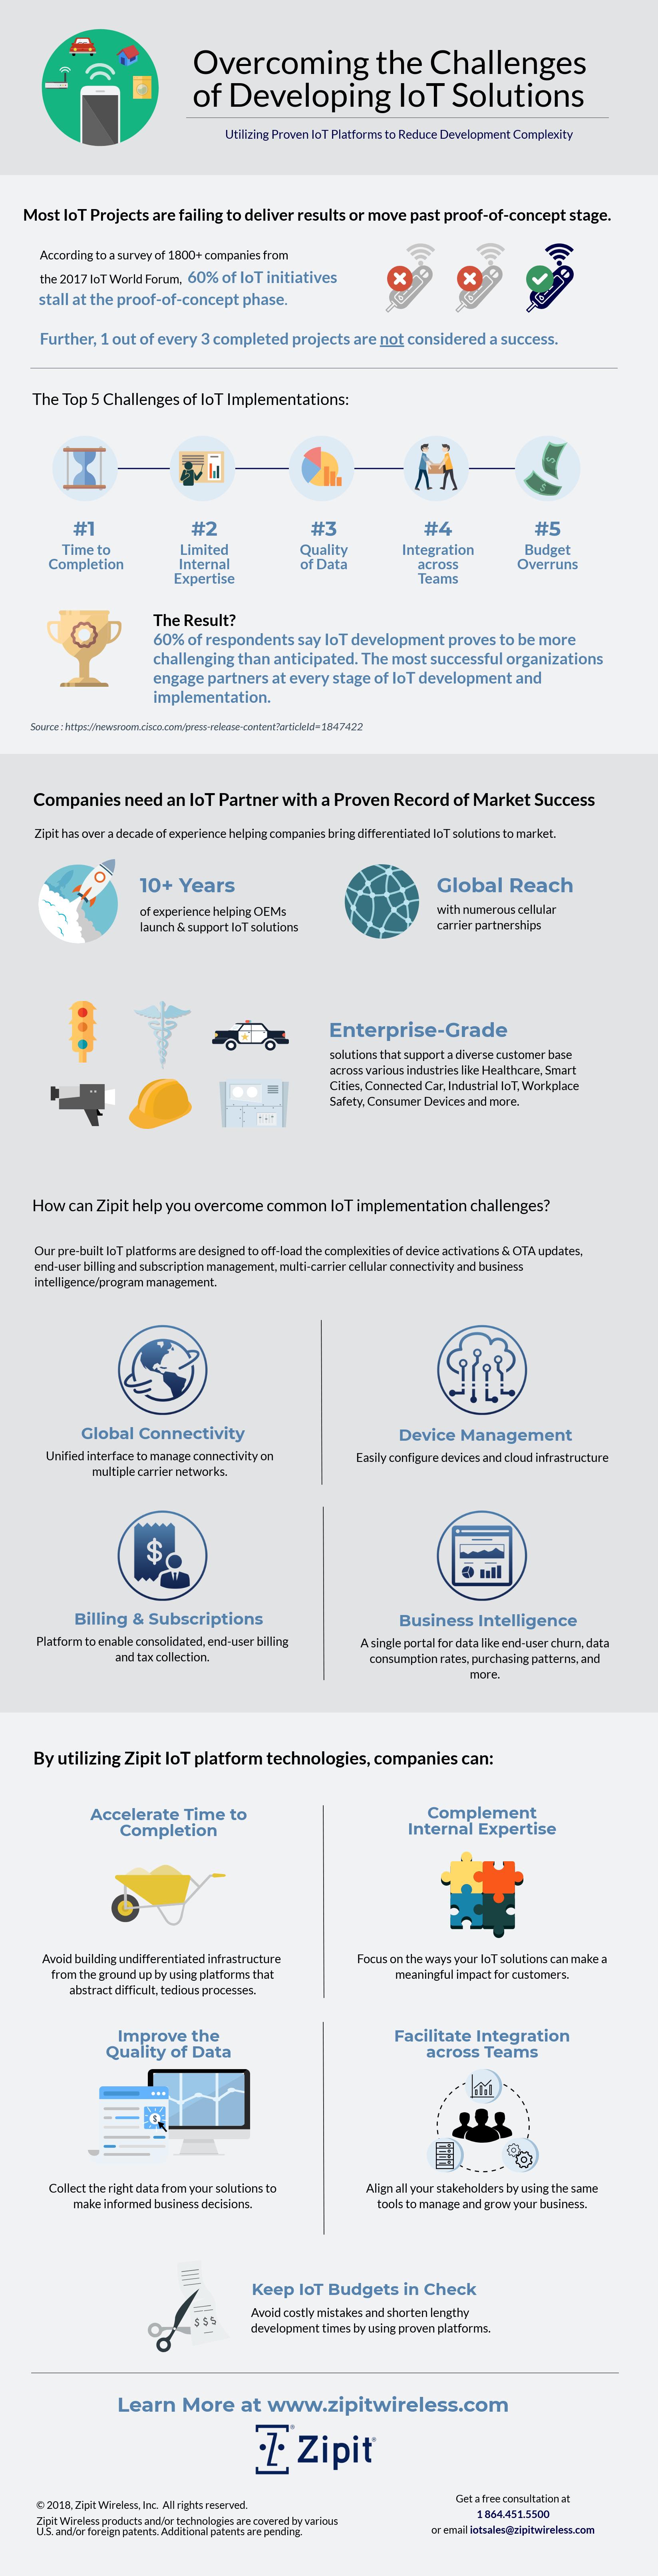 Overcoming IoT Development Challenges_infographic